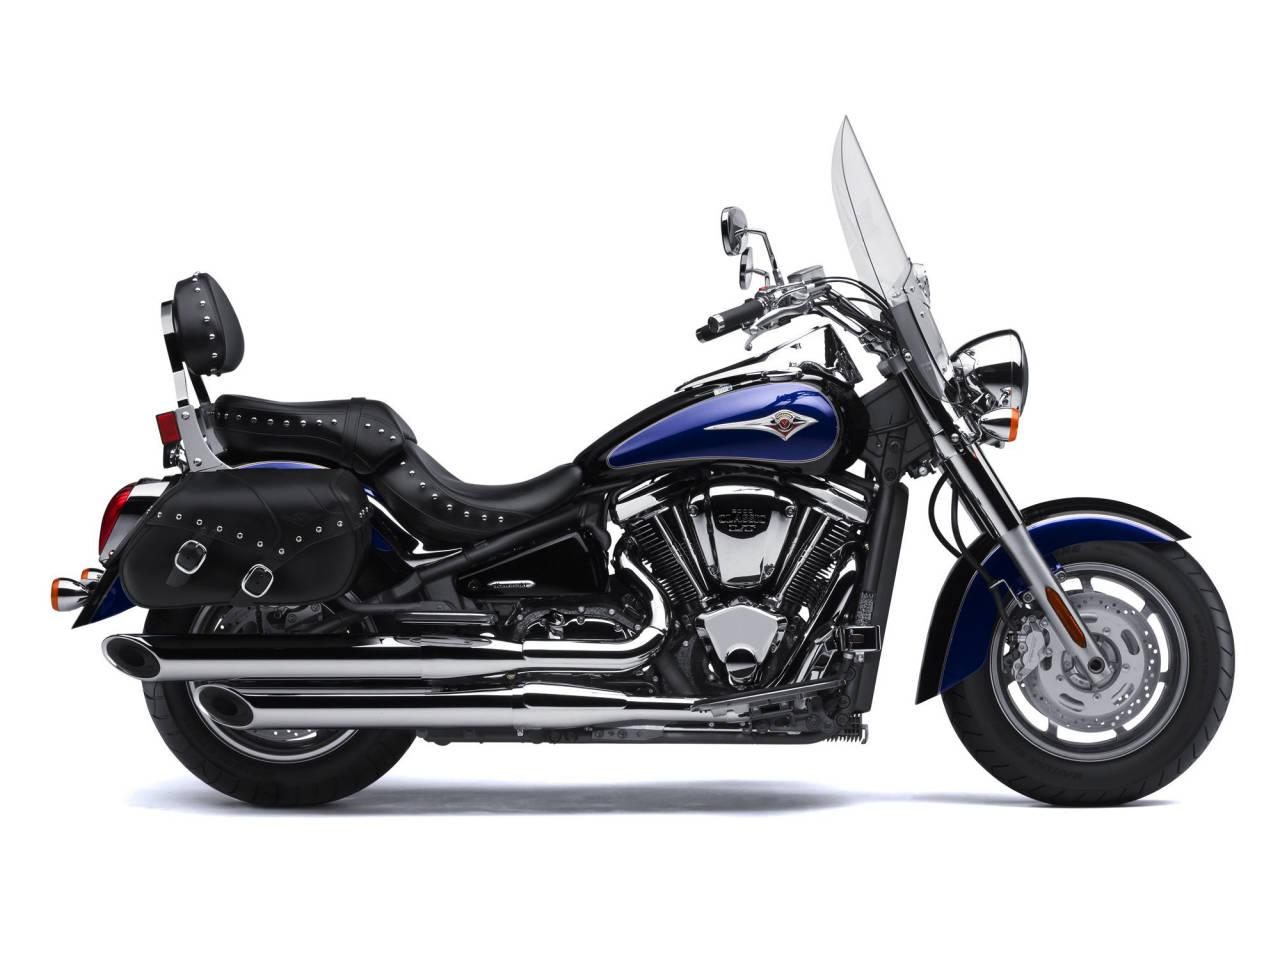 291677542403 additionally 96489 Sexy Lingerie Girls Motorcycle Hd Wallpaper also 2010 Kawasaki Vulcan 2000 Classic Lt in addition Kymco Agility 50 also 153153 Starlane Engear Plug N Play Gear Indicator. on 2010 kawasaki ninja 300